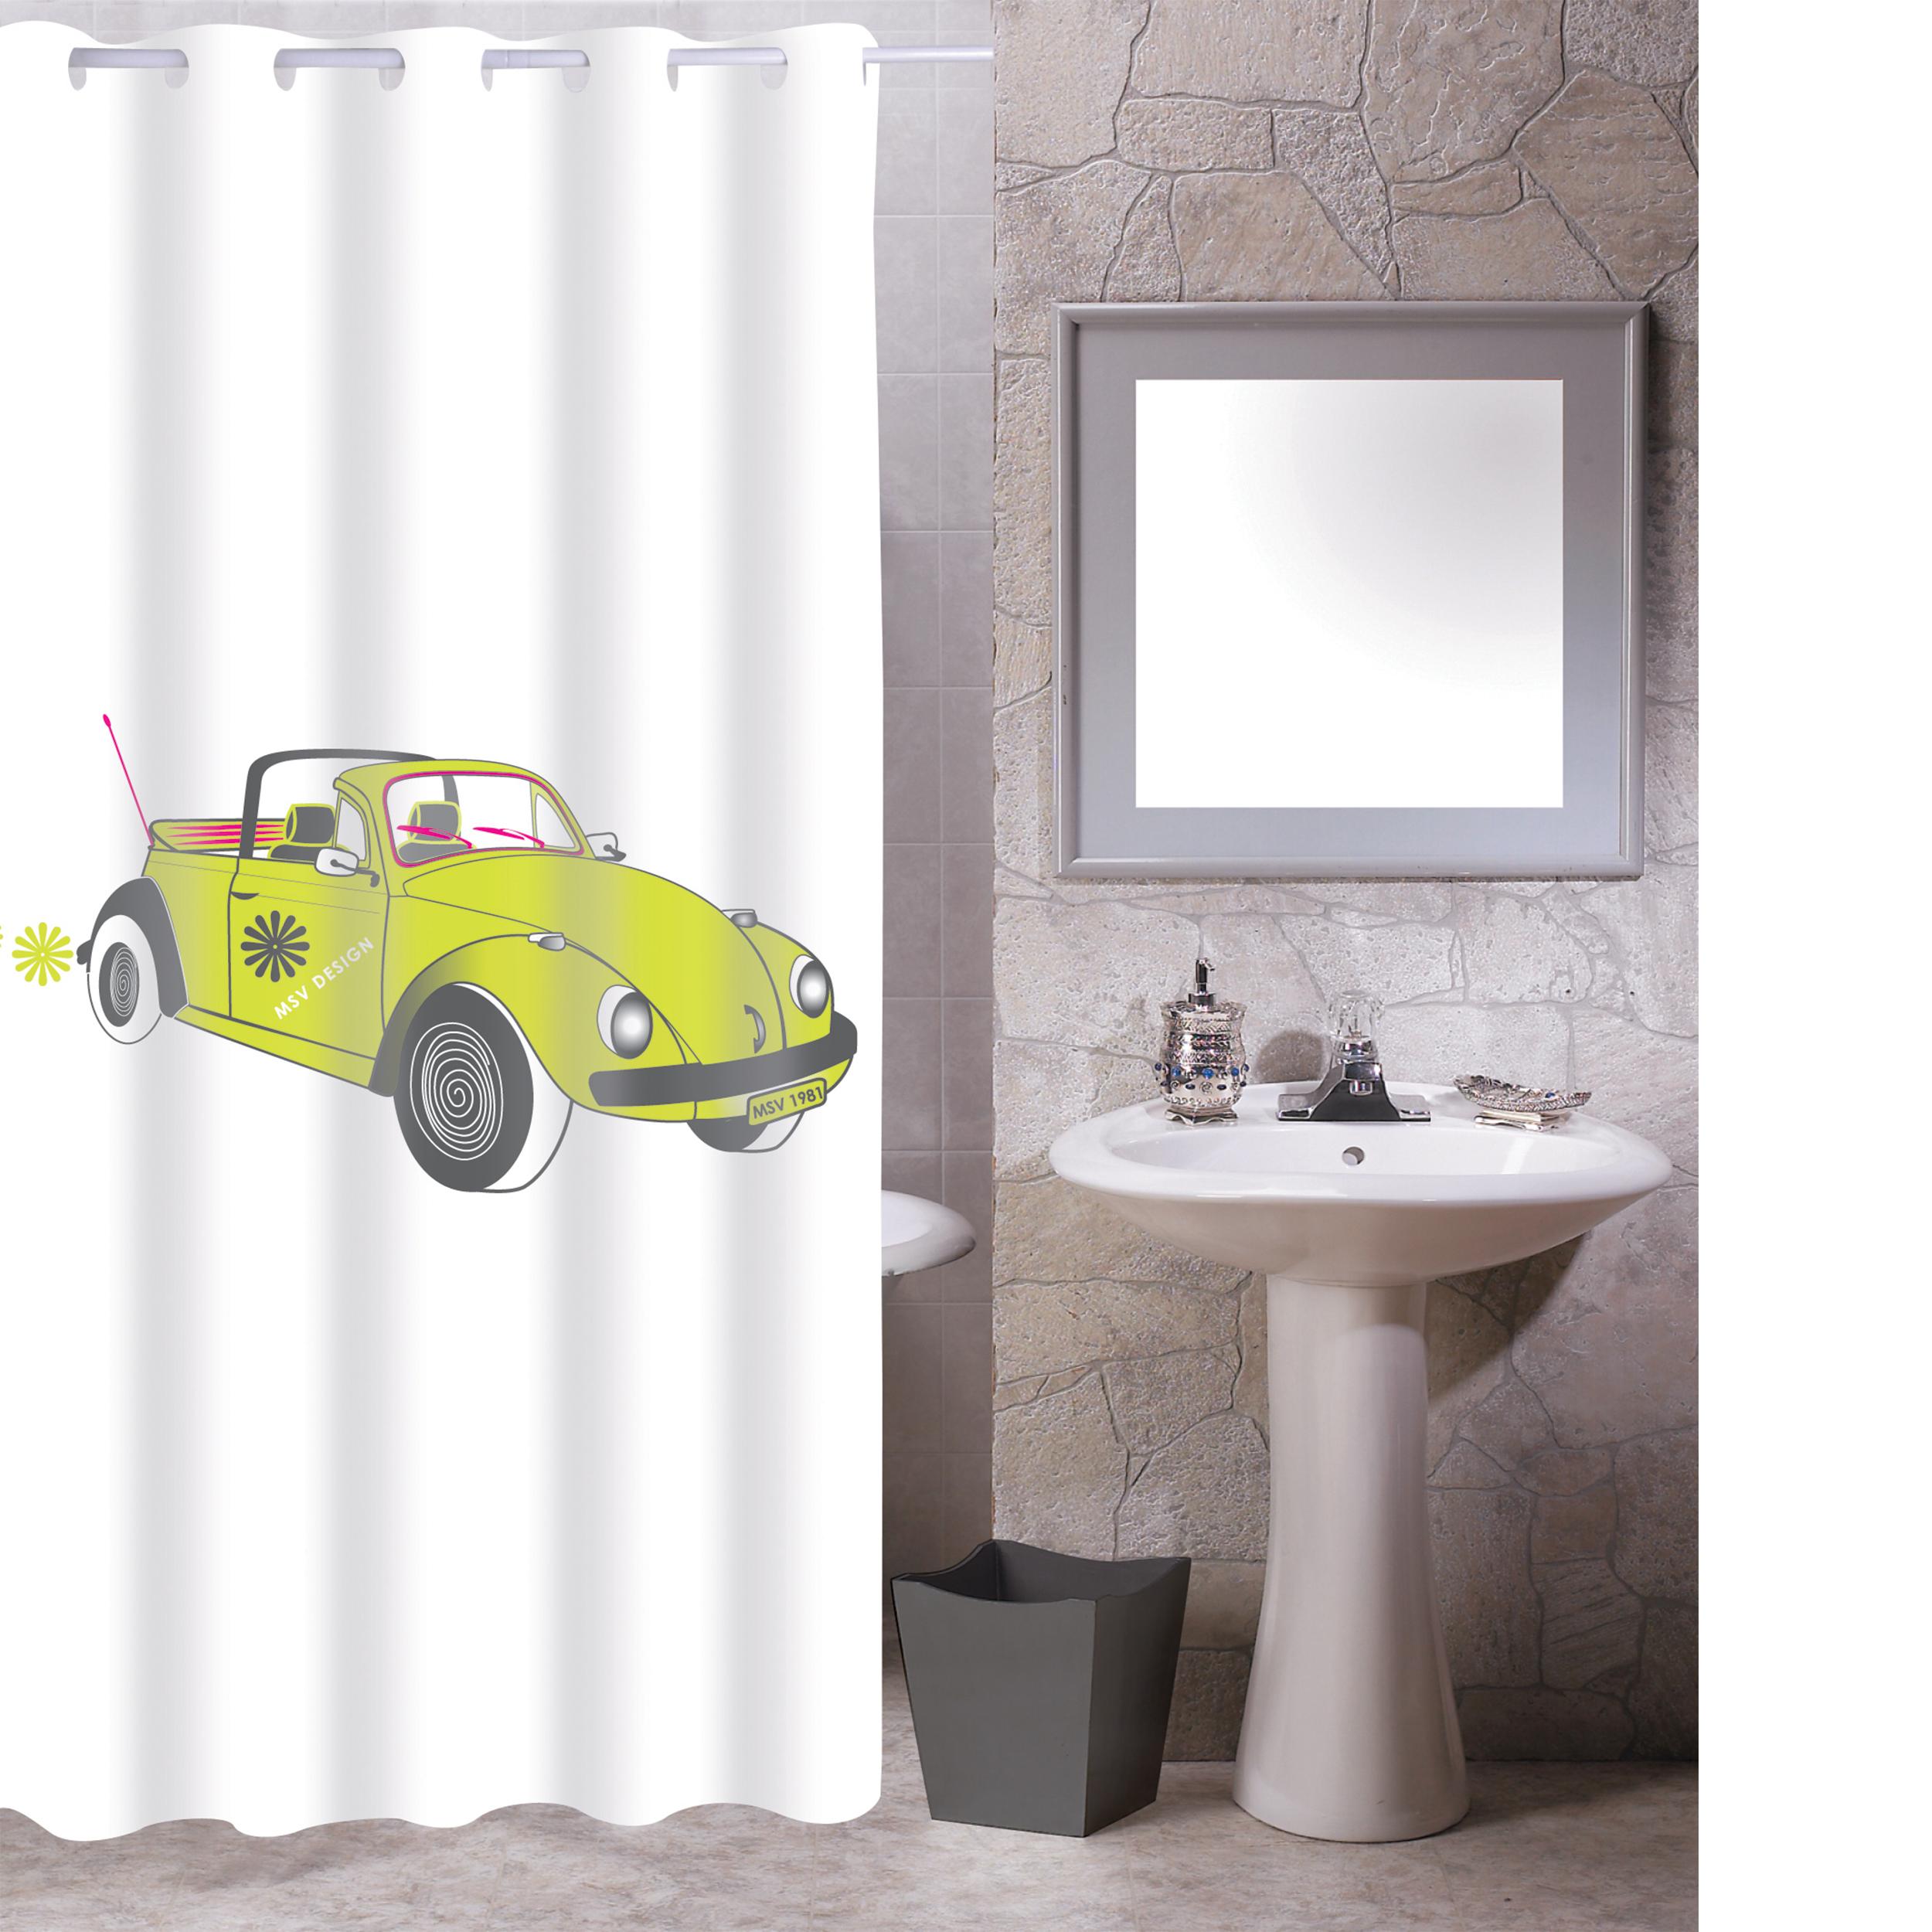 MSV Duschvorhang 180x200cm Anti Schimmel Textil Badewannenvorhang Wannenvorhang Cox